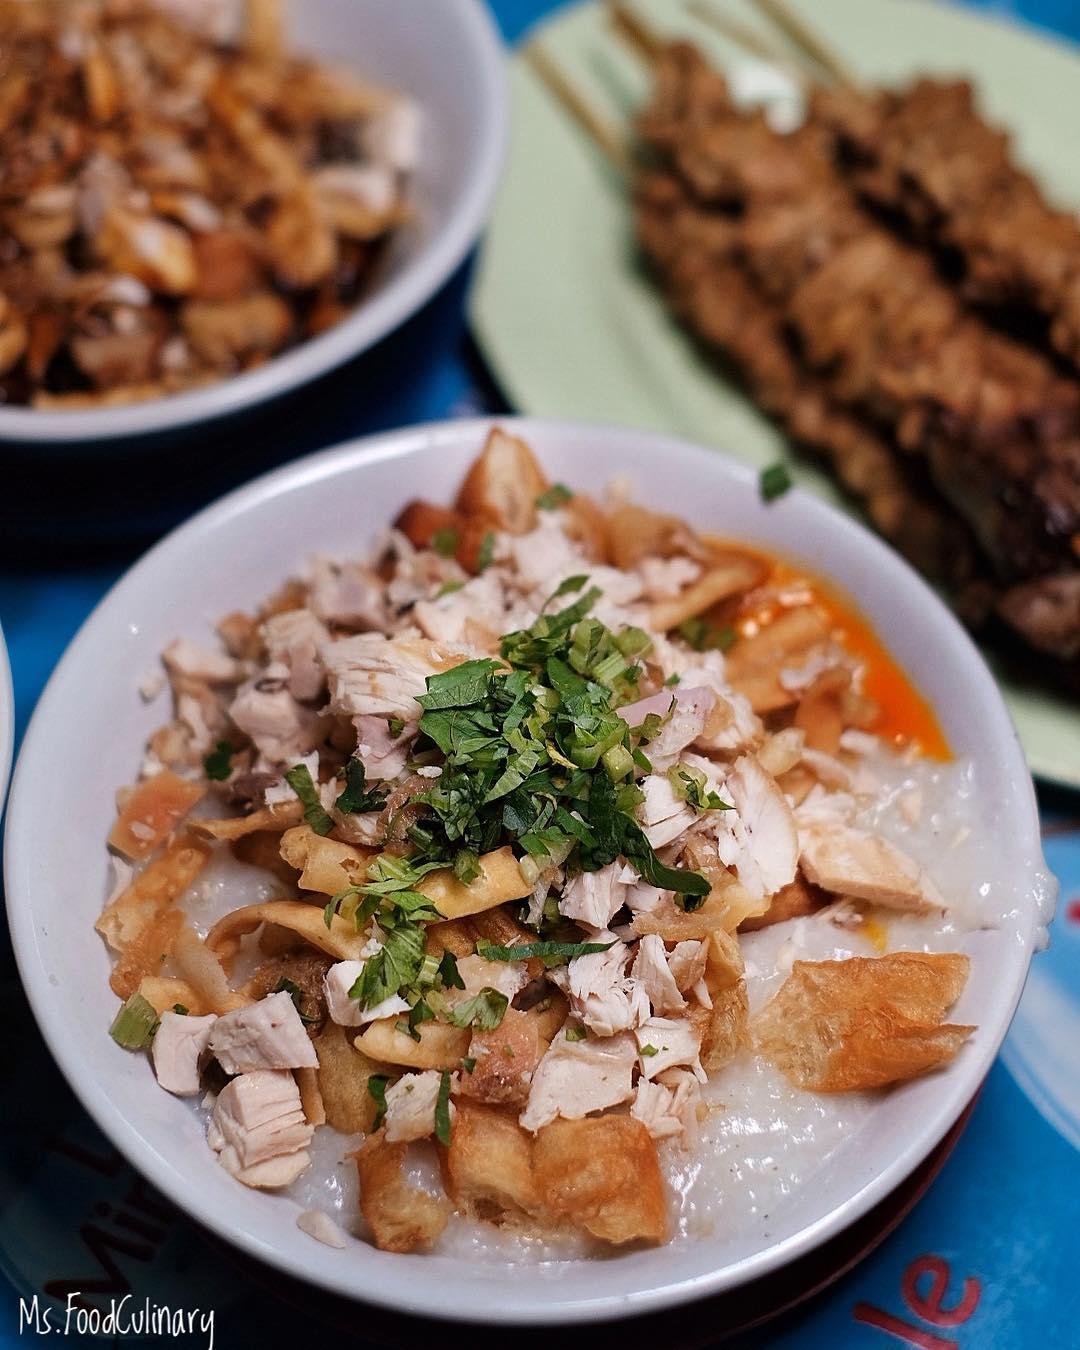 5 Kuliner Tenda Di Jakarta Rasanya Enak Seperti Restoran